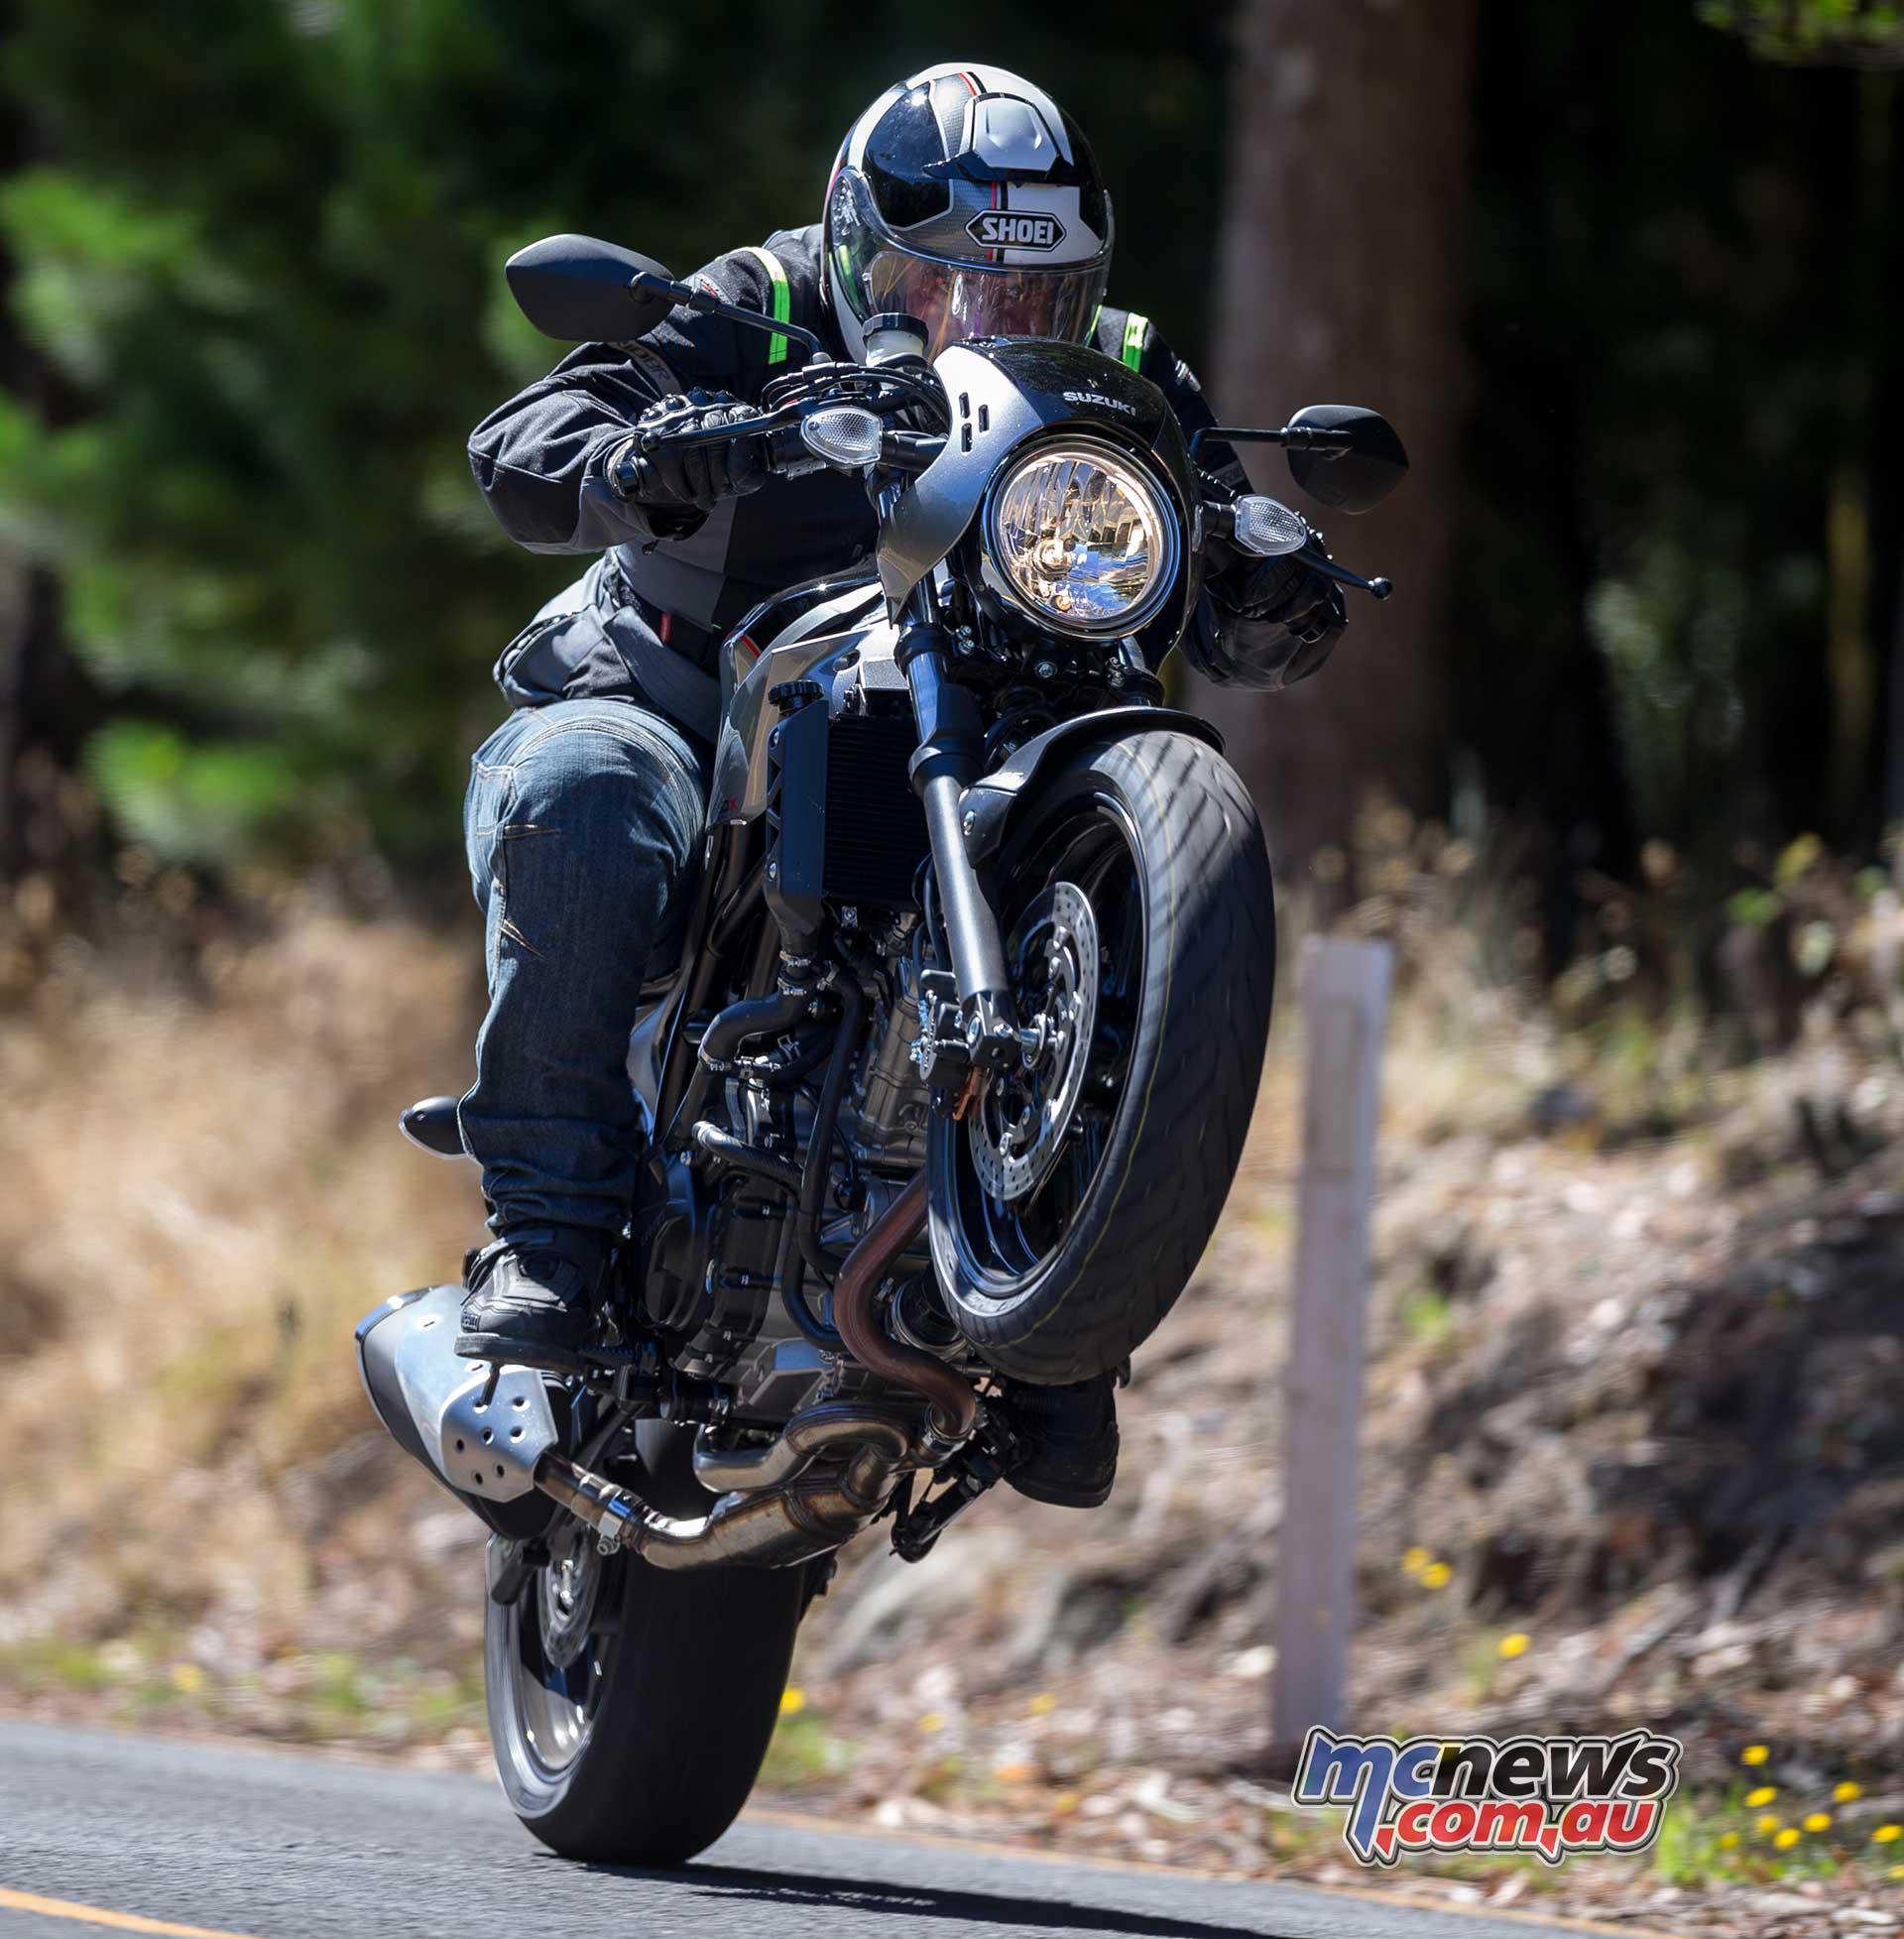 2018 suzuki sv650x review motorcycle test. Black Bedroom Furniture Sets. Home Design Ideas